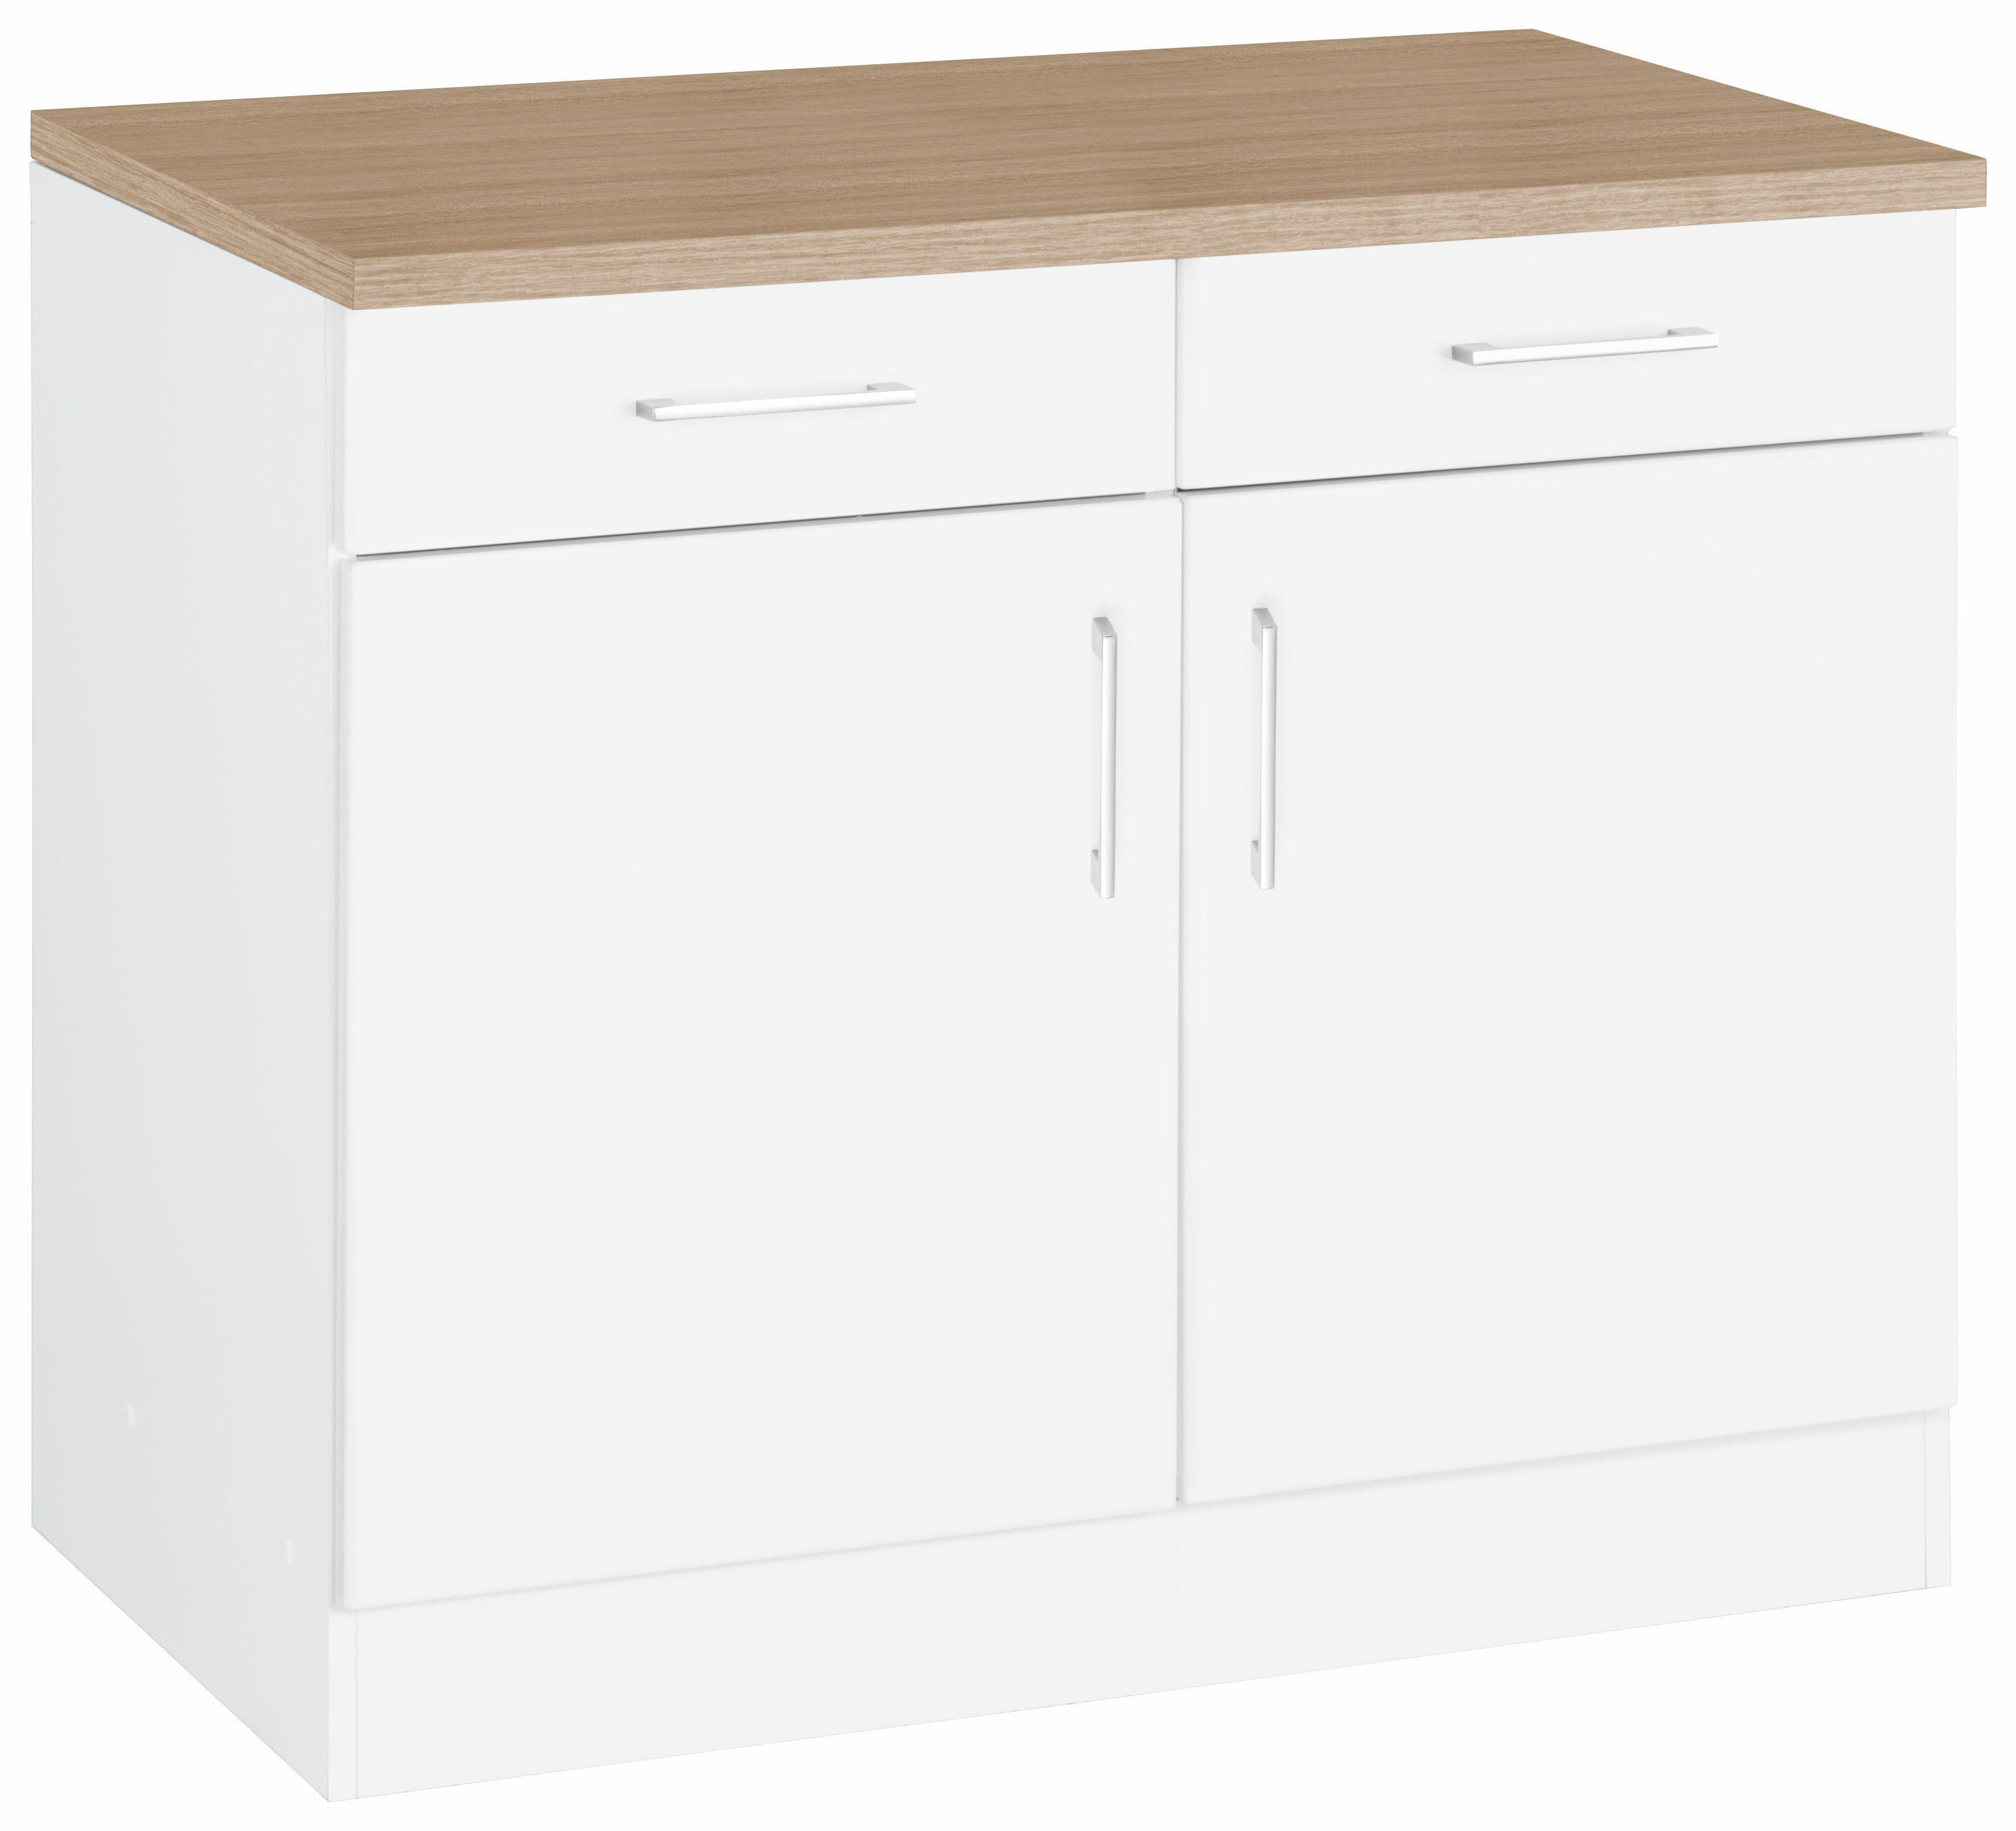 Ikea kuche unterschrank 100 for Ikea kuchen unterschrank